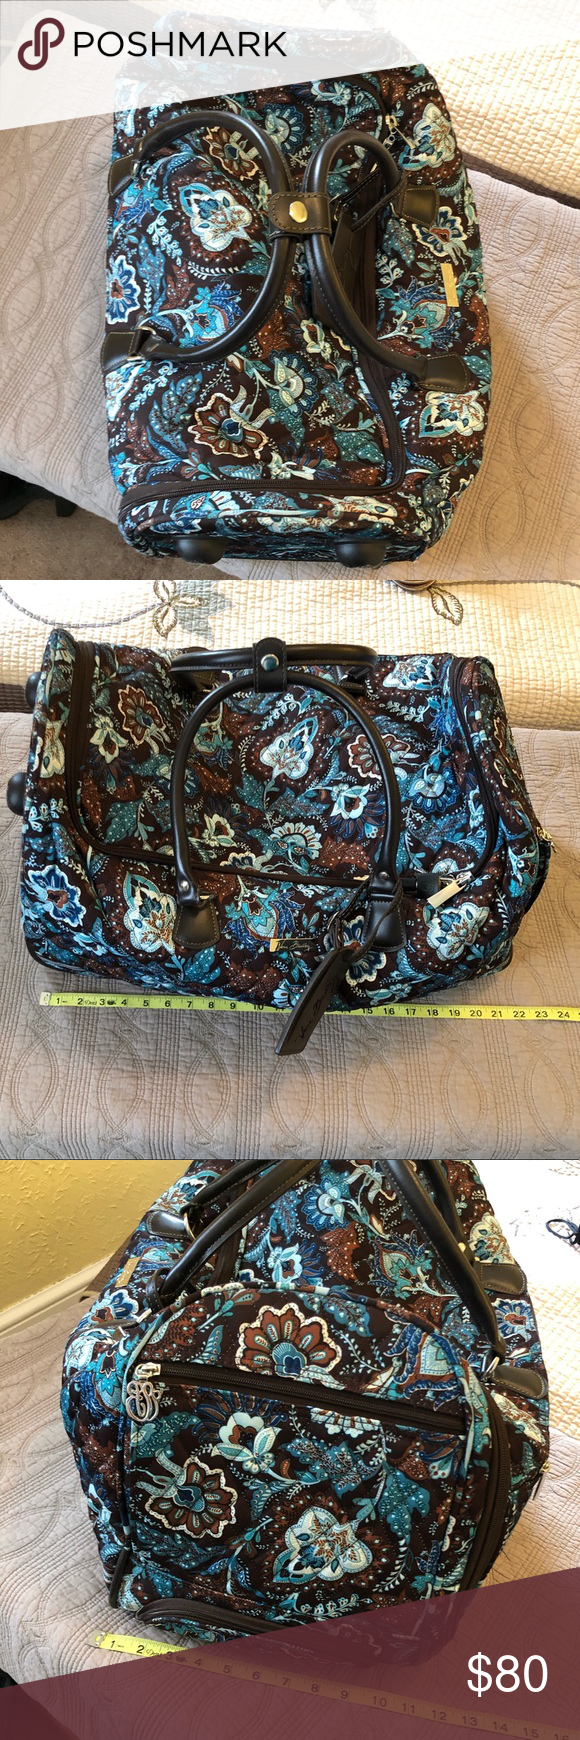 1e40258e87 Vera Bradley Java Blue roller suitcase bag Great condition